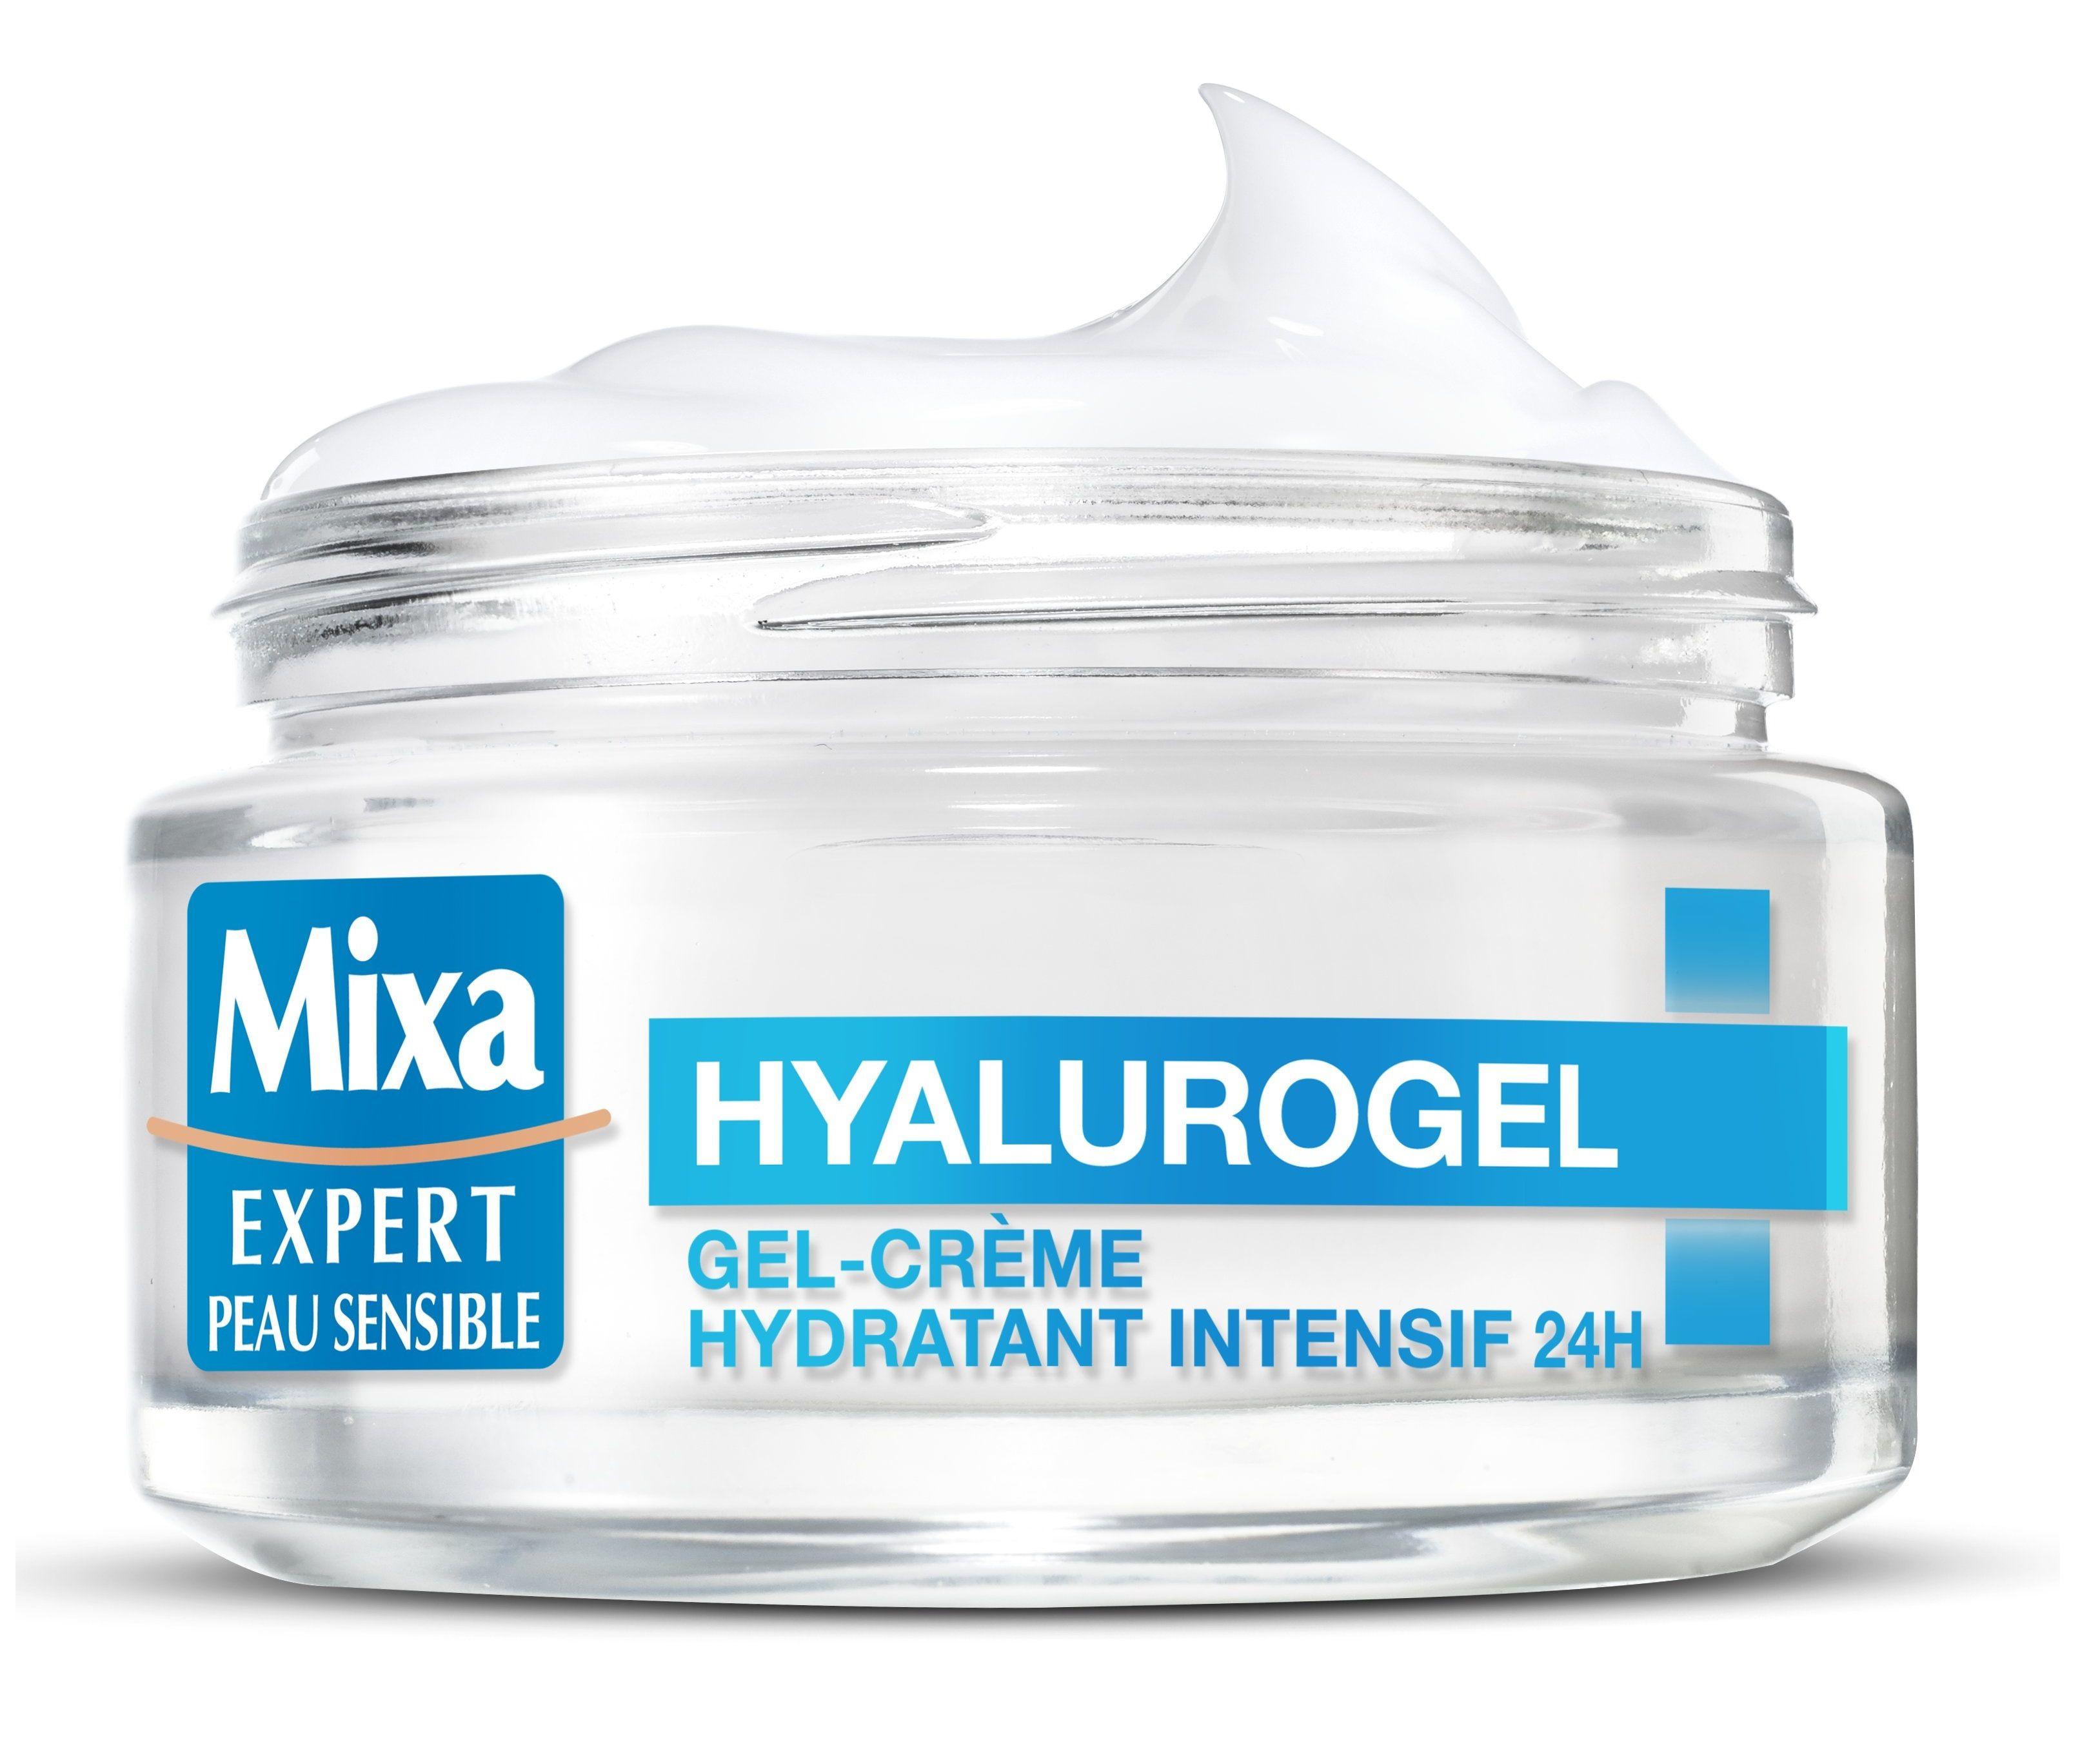 Hyalurogel Gel-Crème Hydratant Intensif 24H, Mixa - Avis